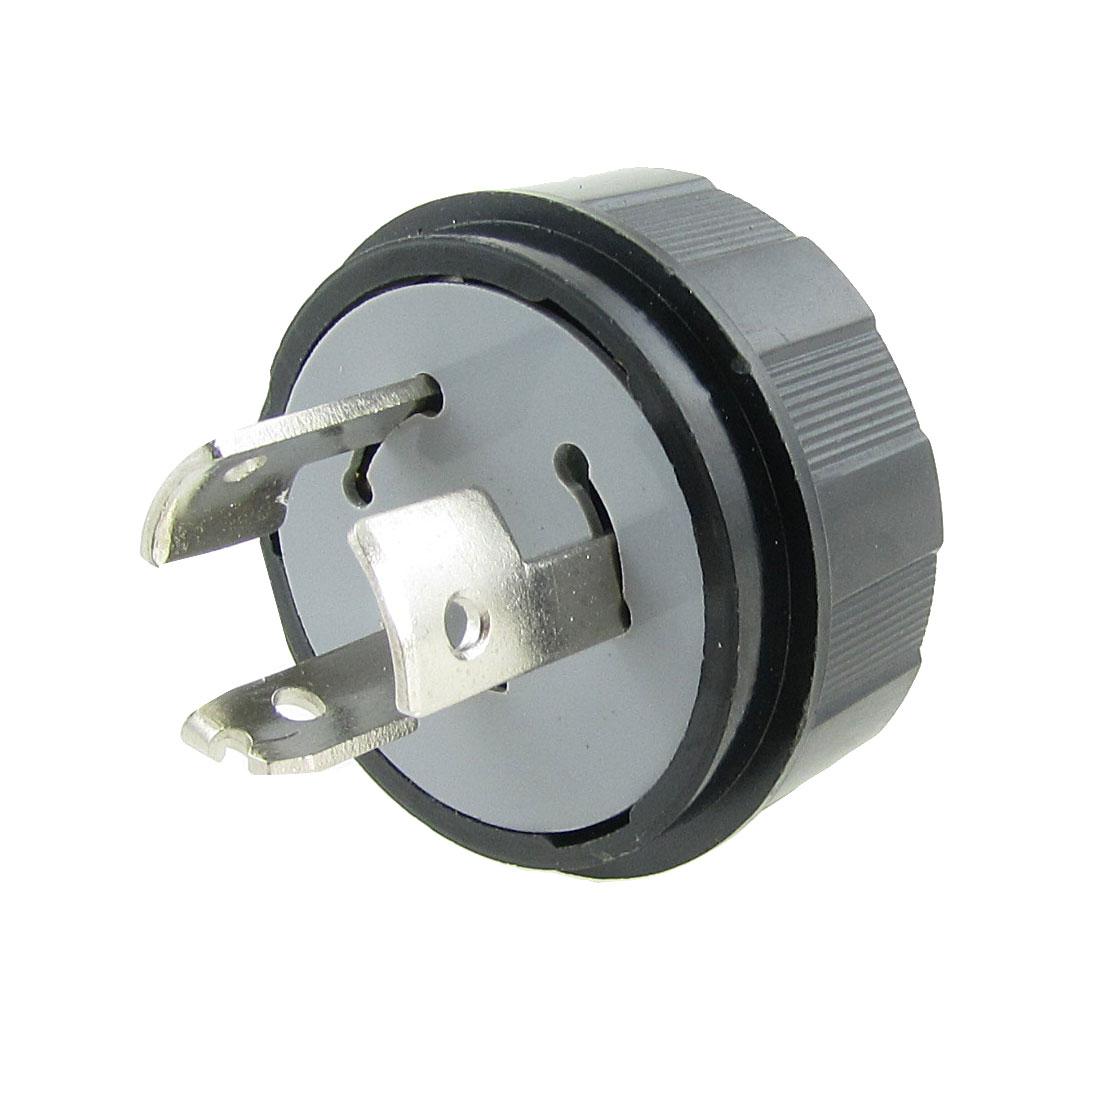 Black LK6320 20A AC 250V Twist Locking 3 Pin Male Plug